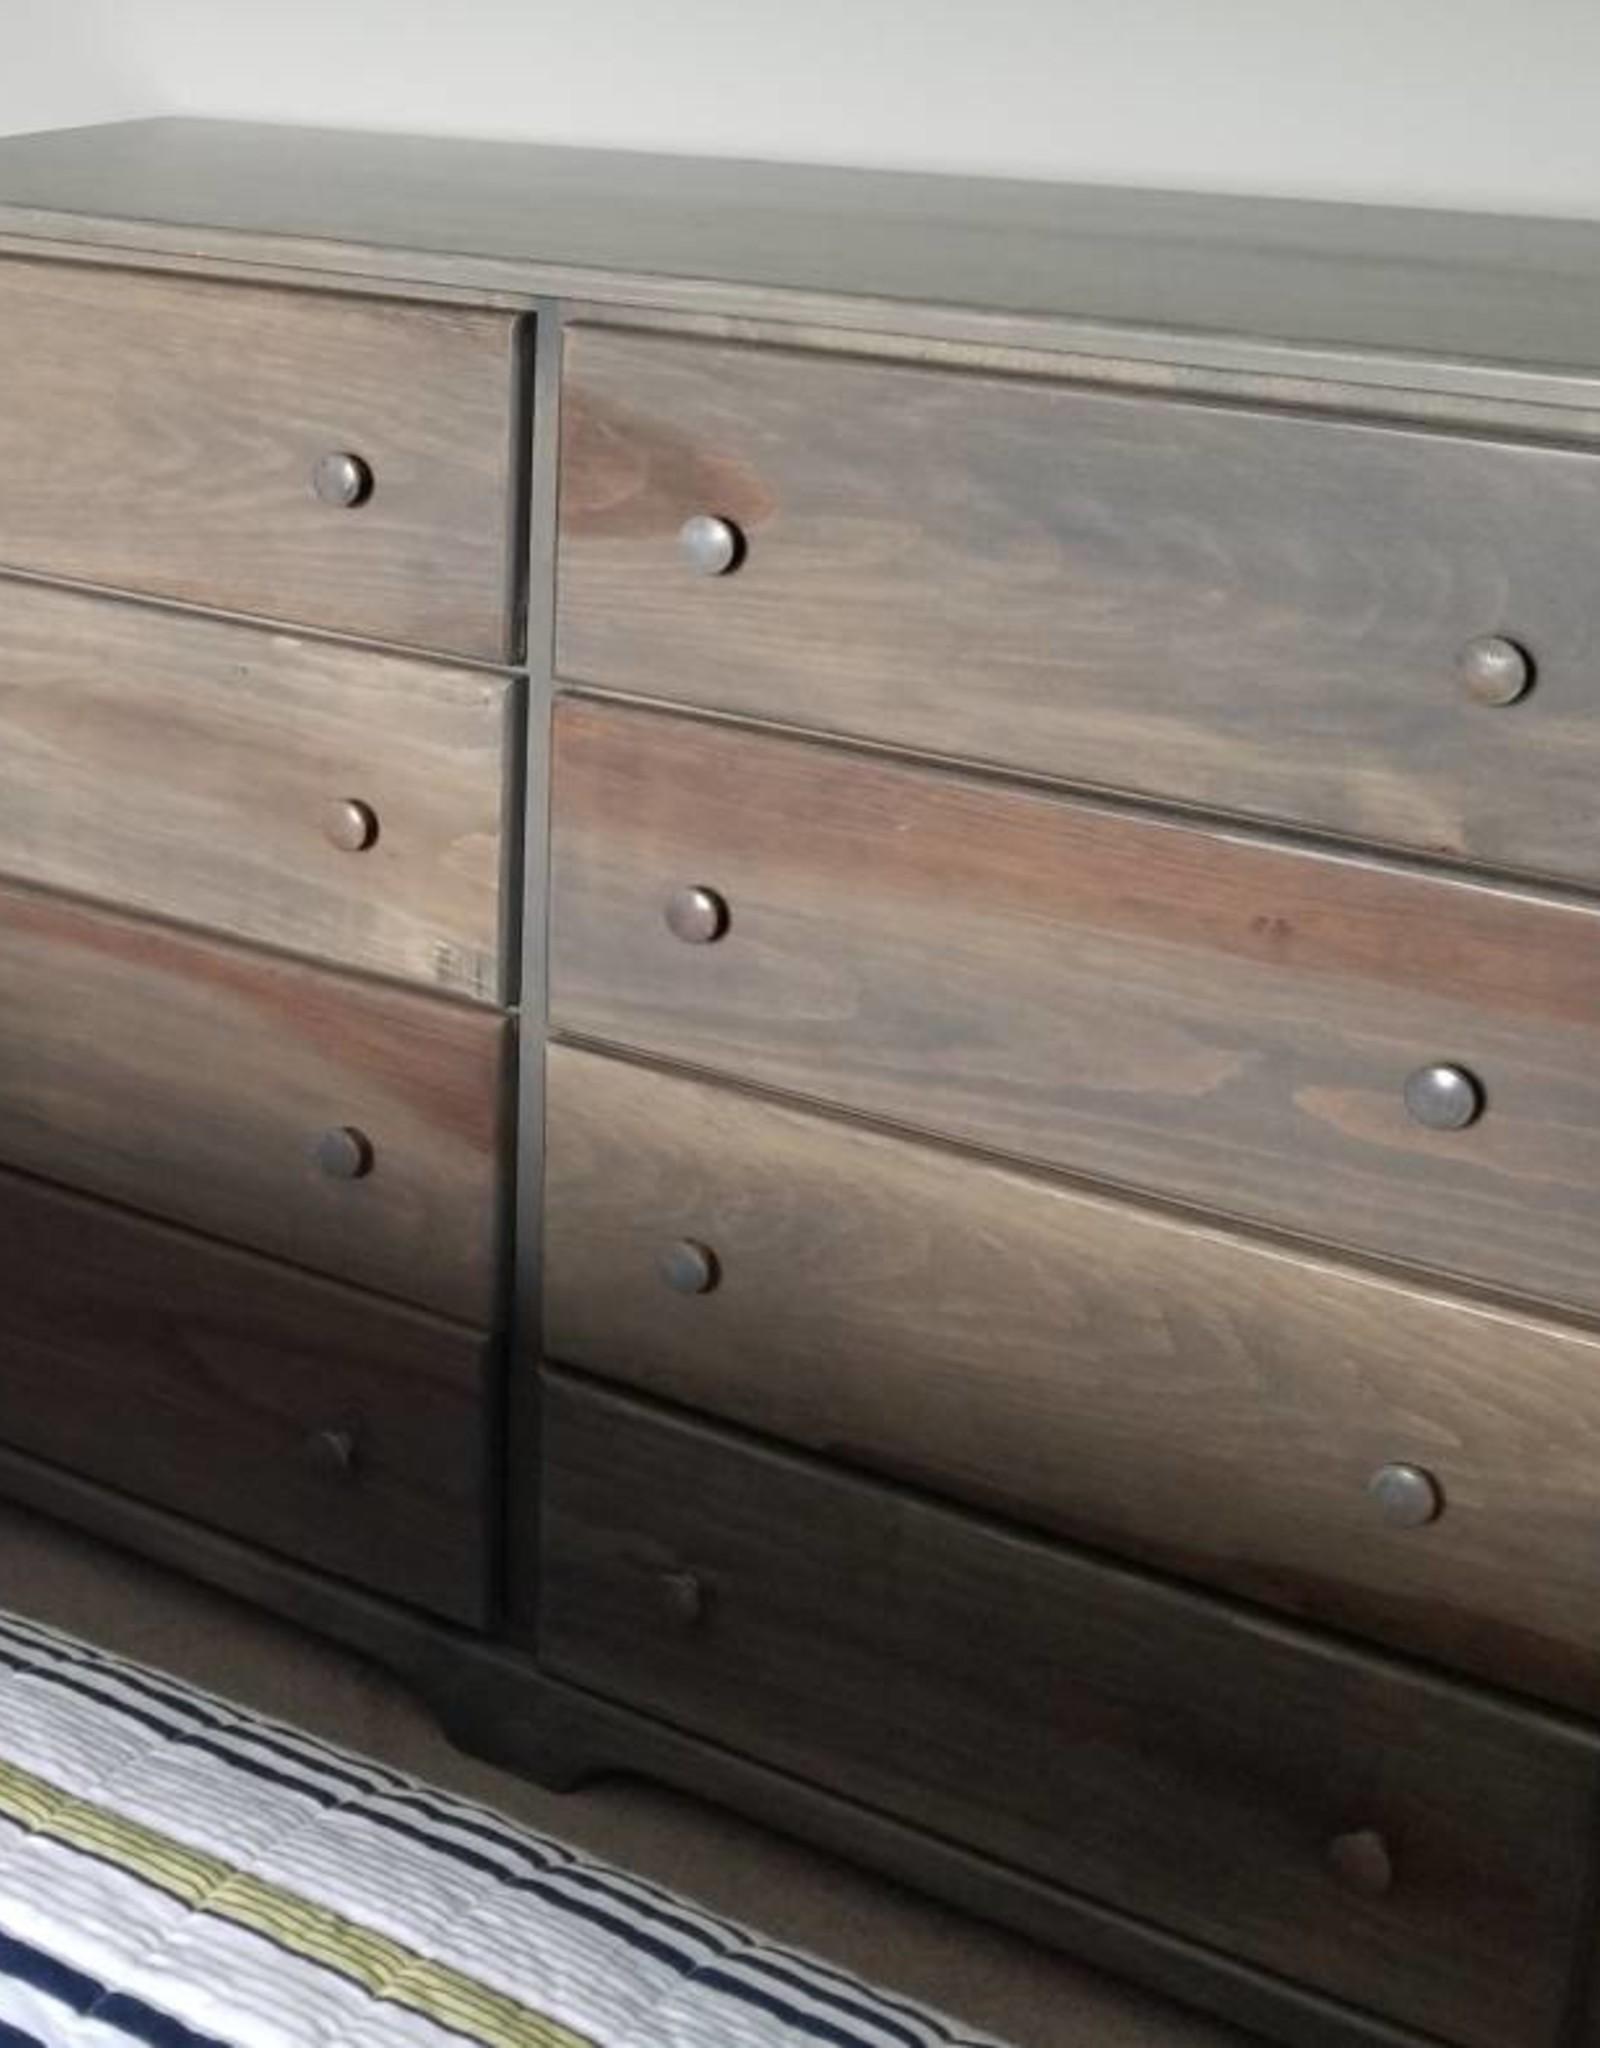 Fighting Creek Pine 8-Drawer Dresser w/ Euro Glides - w/ Stock Finish